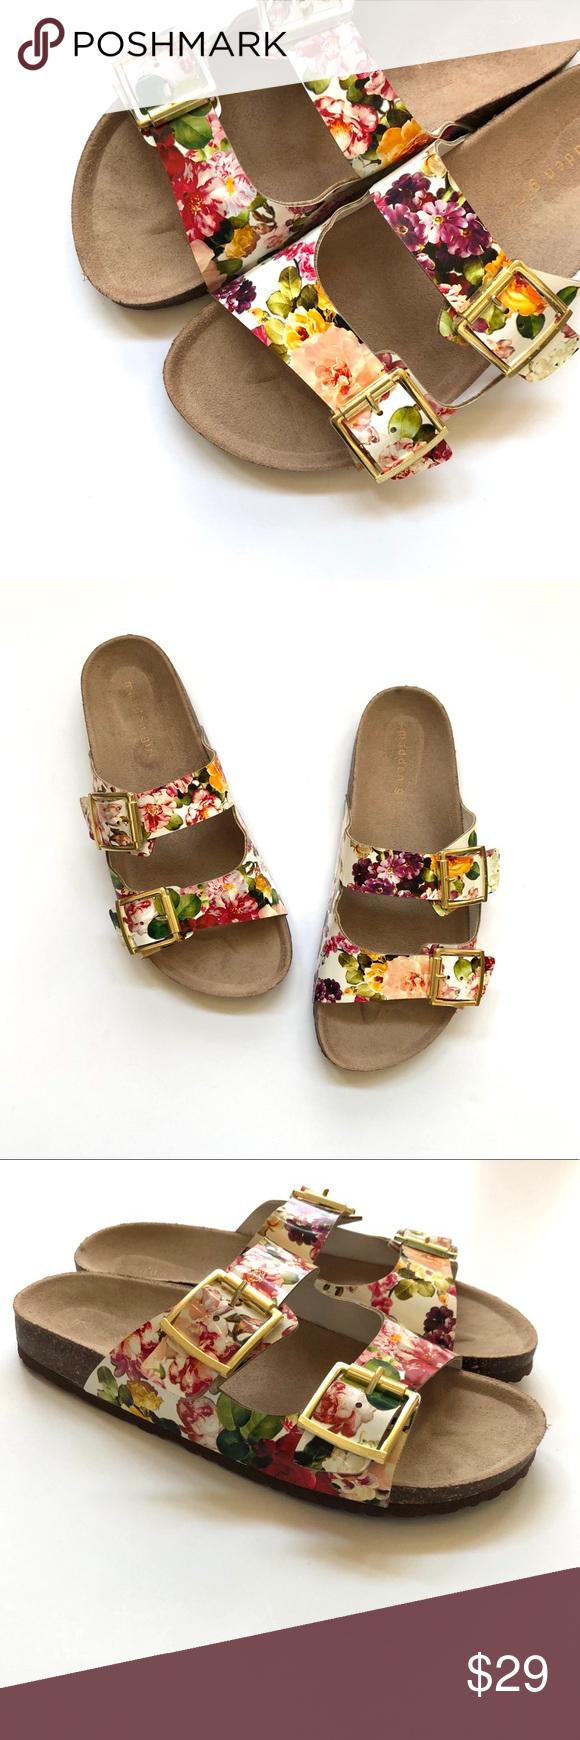 7676196ceb0c3 Madden Girl Brando floral slide sandals Madden Girl slides in excellent  condition! Size 8.5.